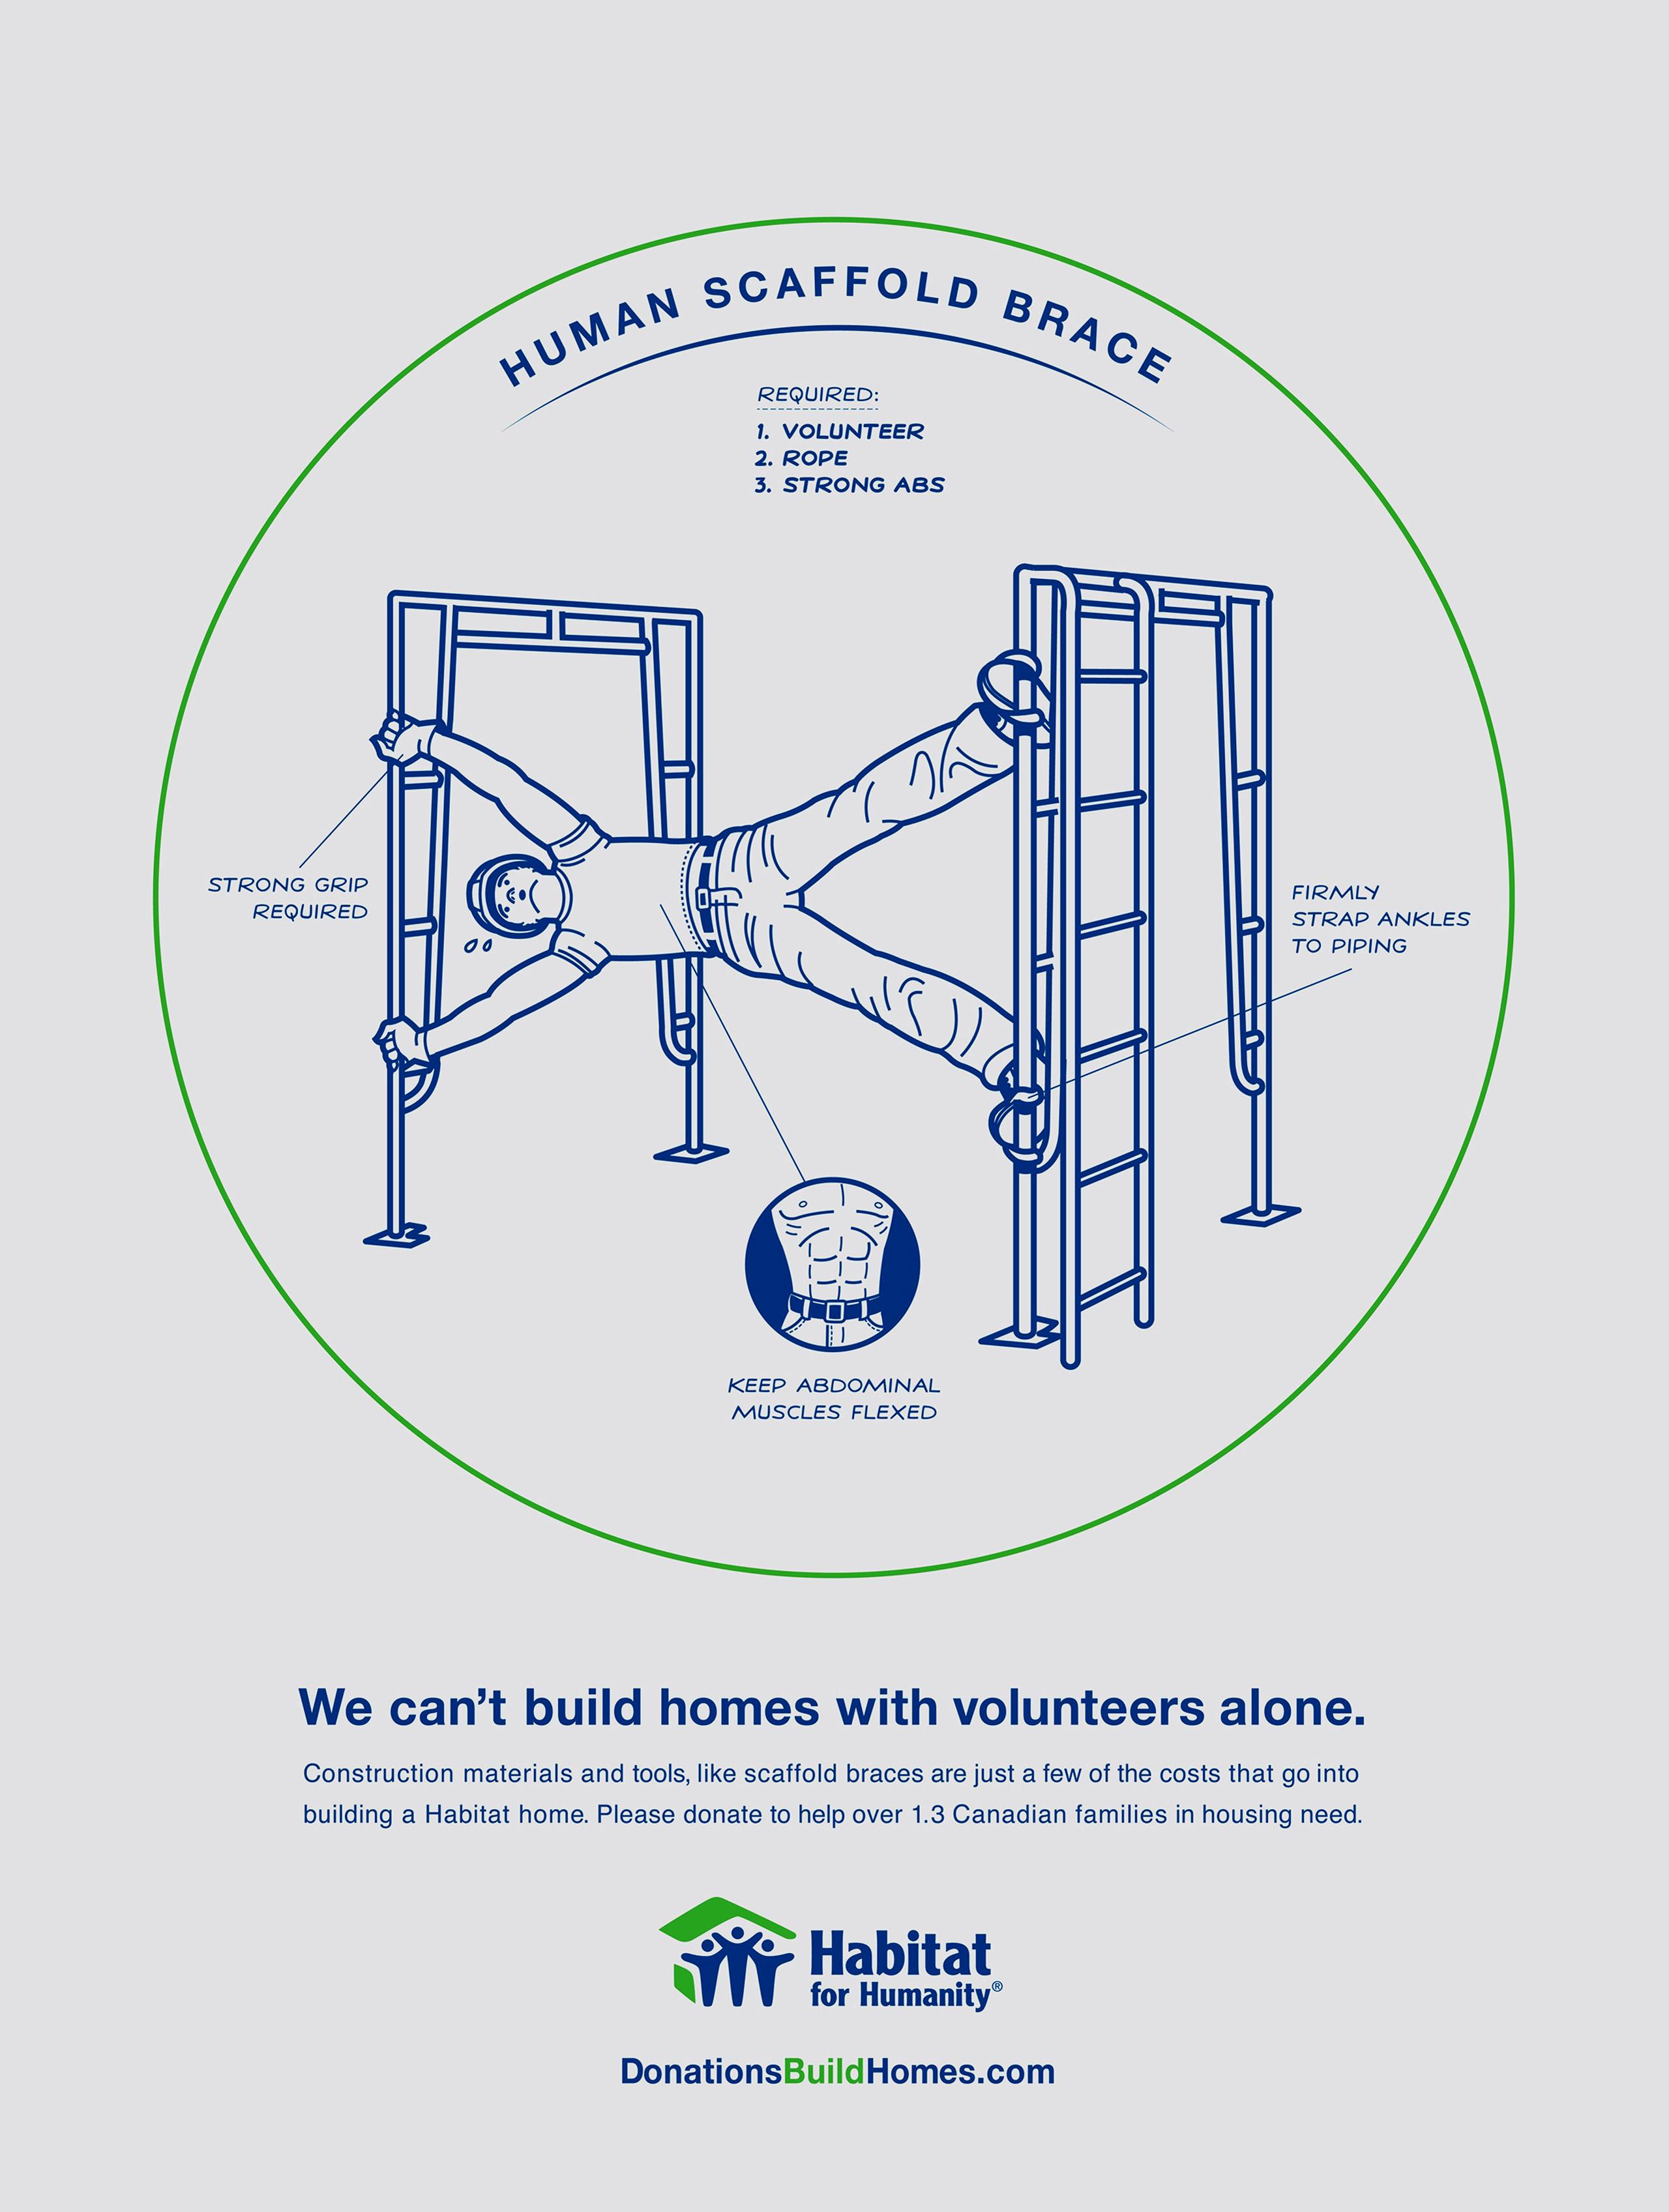 habitat-for-humanity-human-scaffold-brace-2000-84460